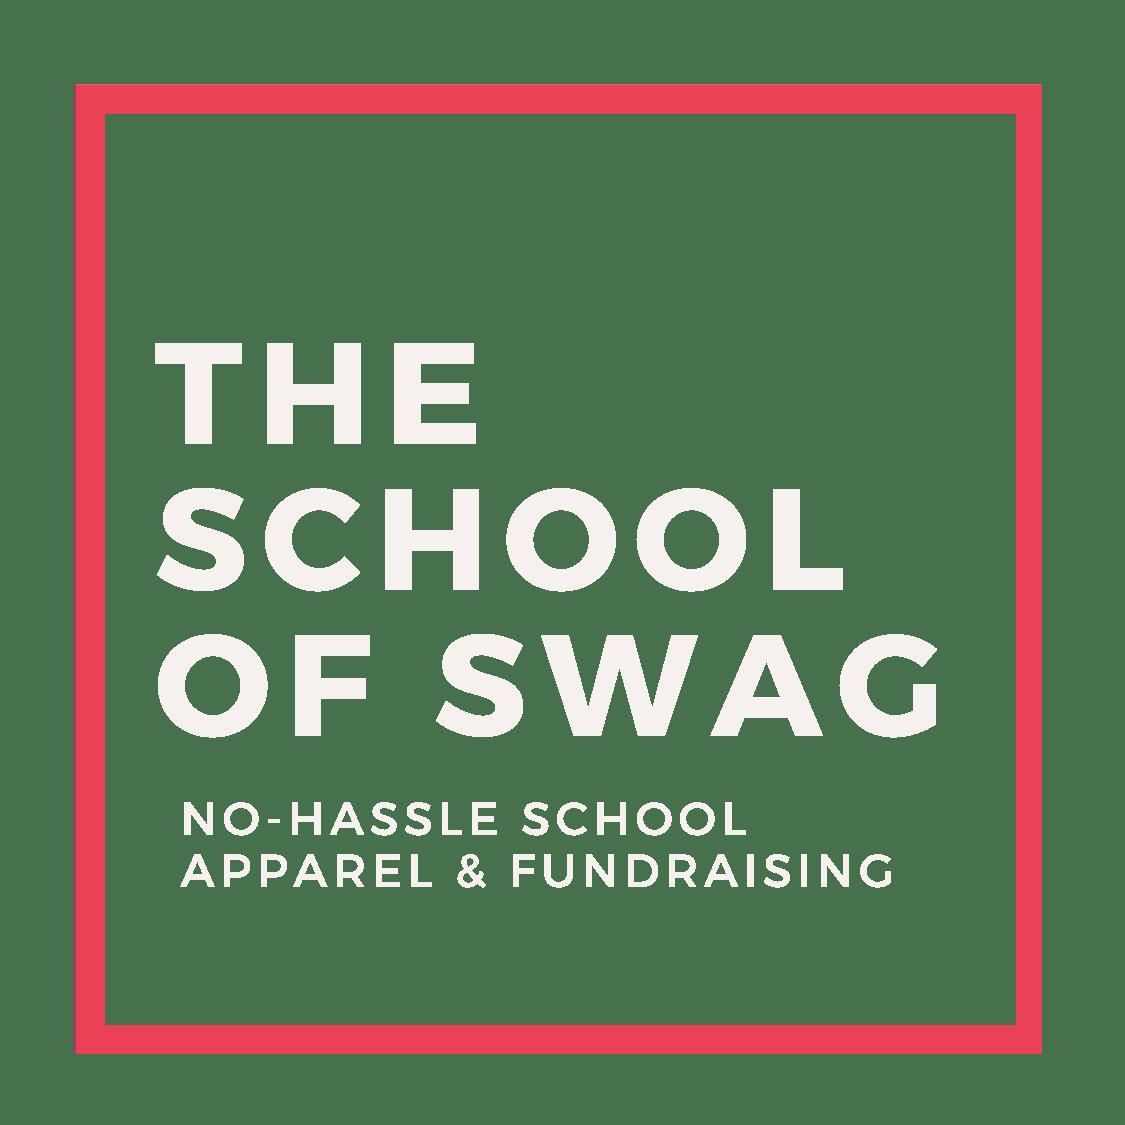 The School of Swag Logo